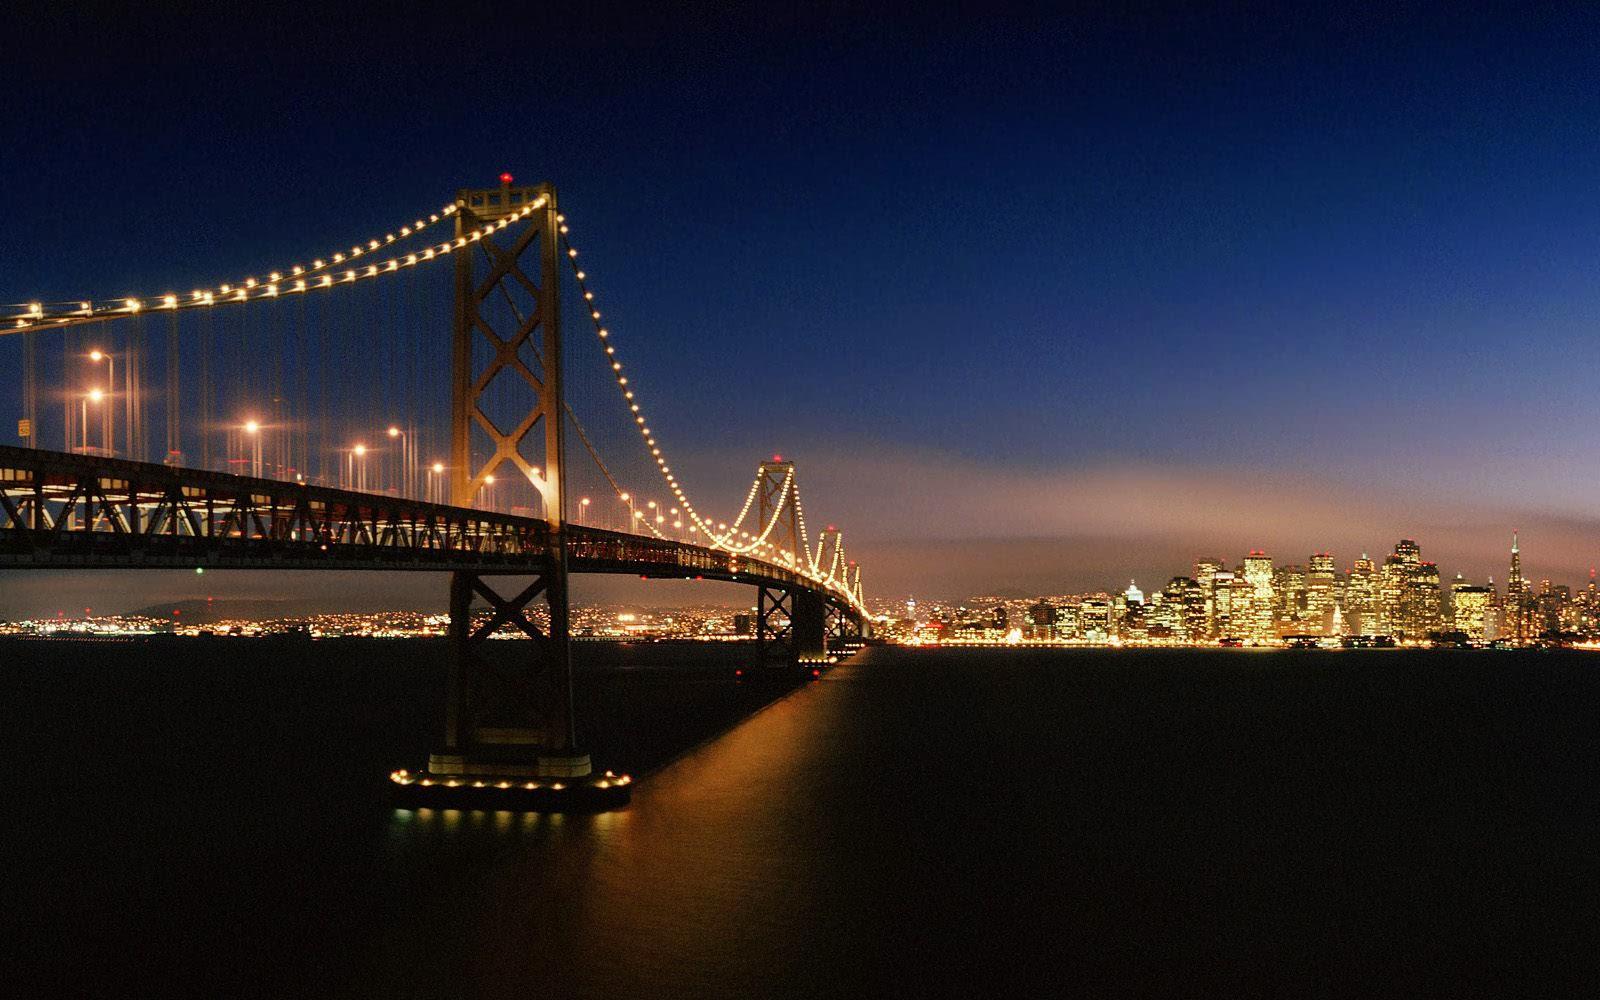 Tag San Francisco Bay Bridge Wallpapers BackgroundsPhotos Images 1600x1000